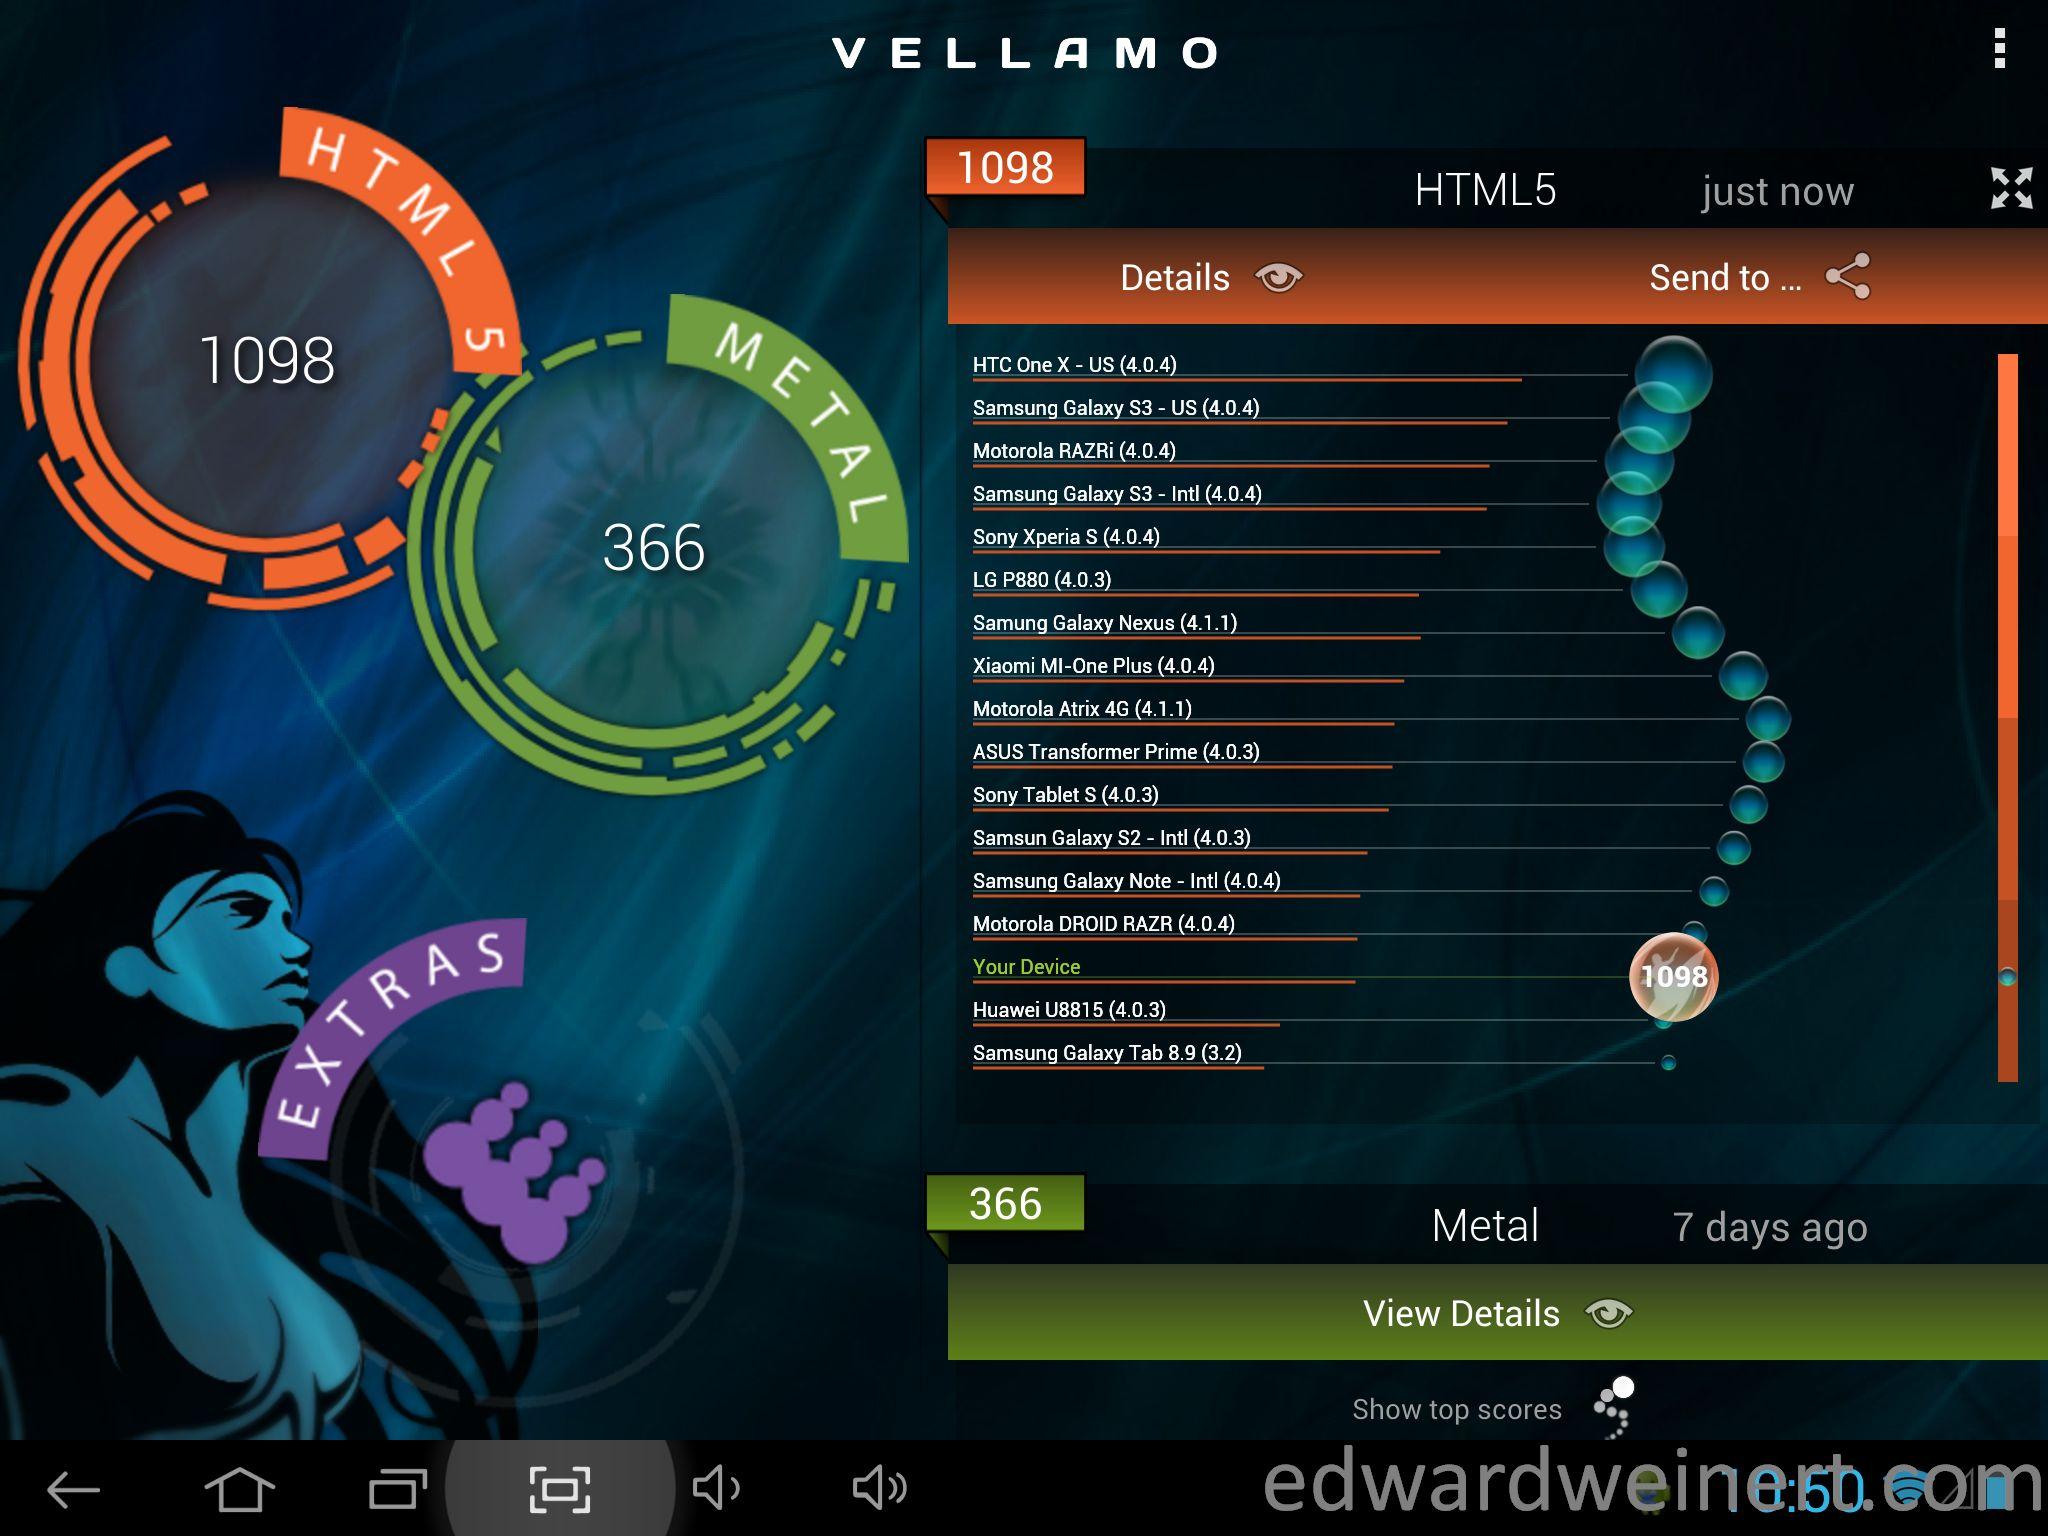 Onda V972 Vellamo